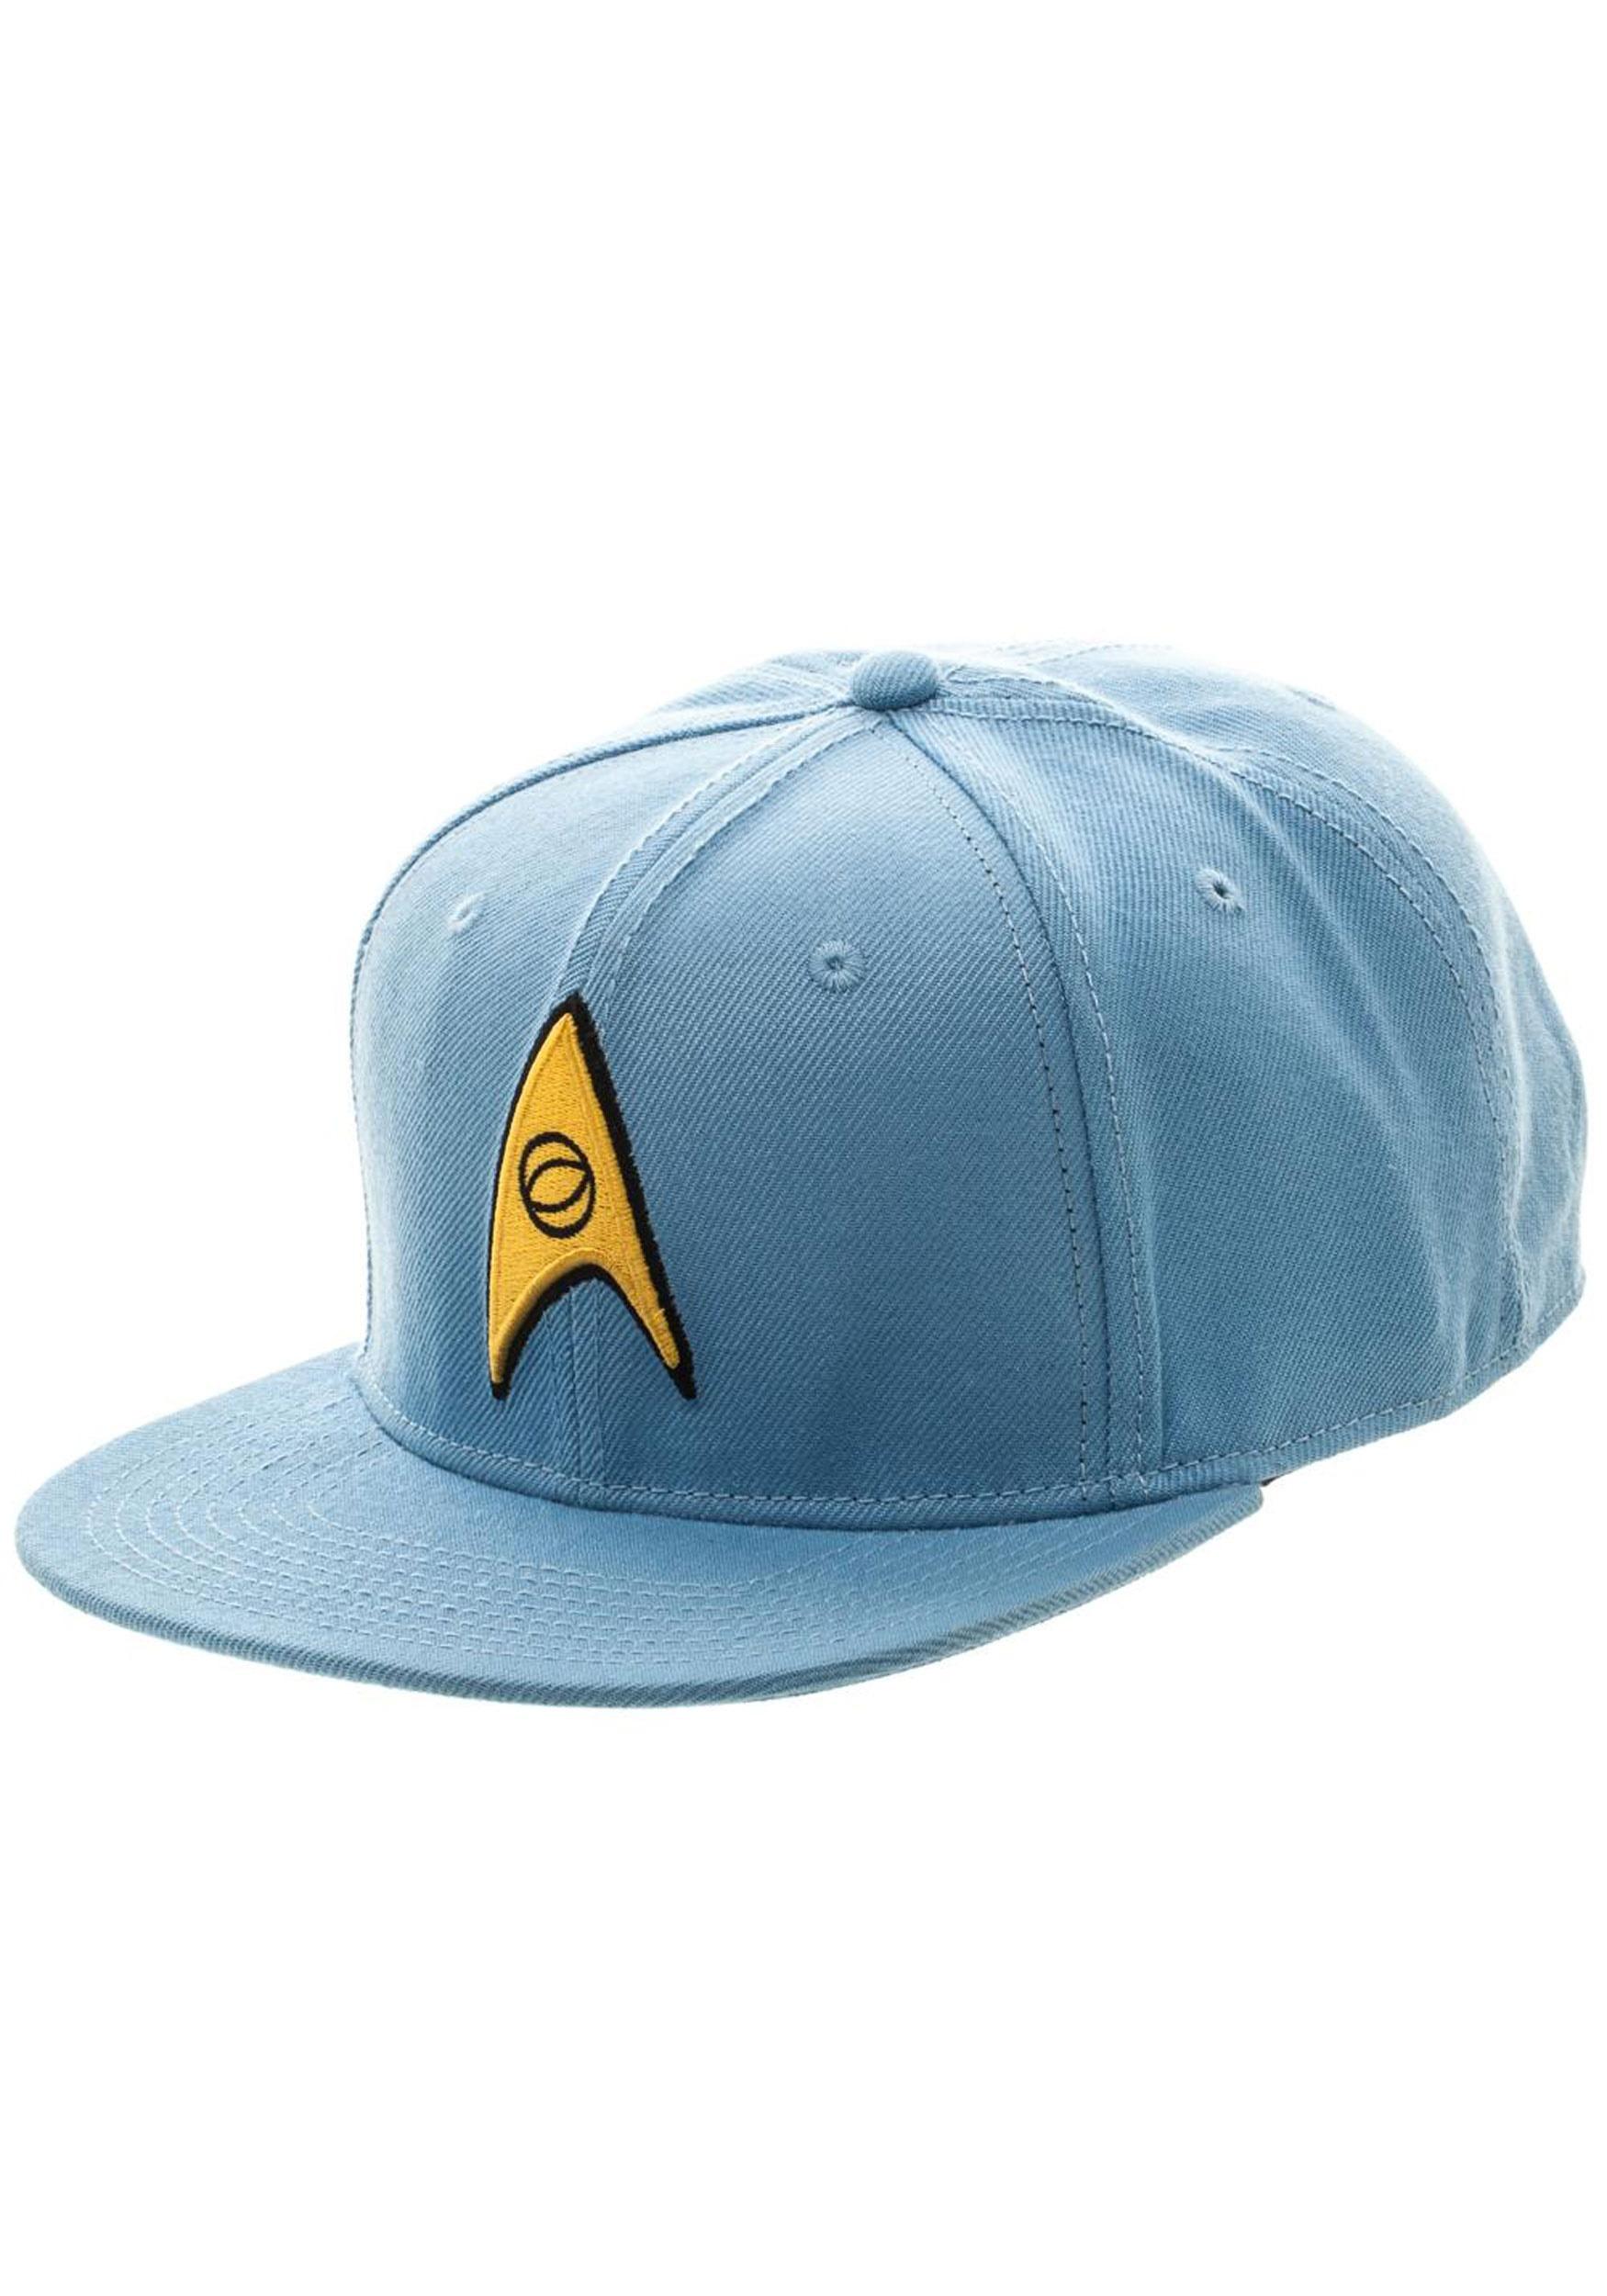 2928547c3 Star Trek Blue Snapback Hat